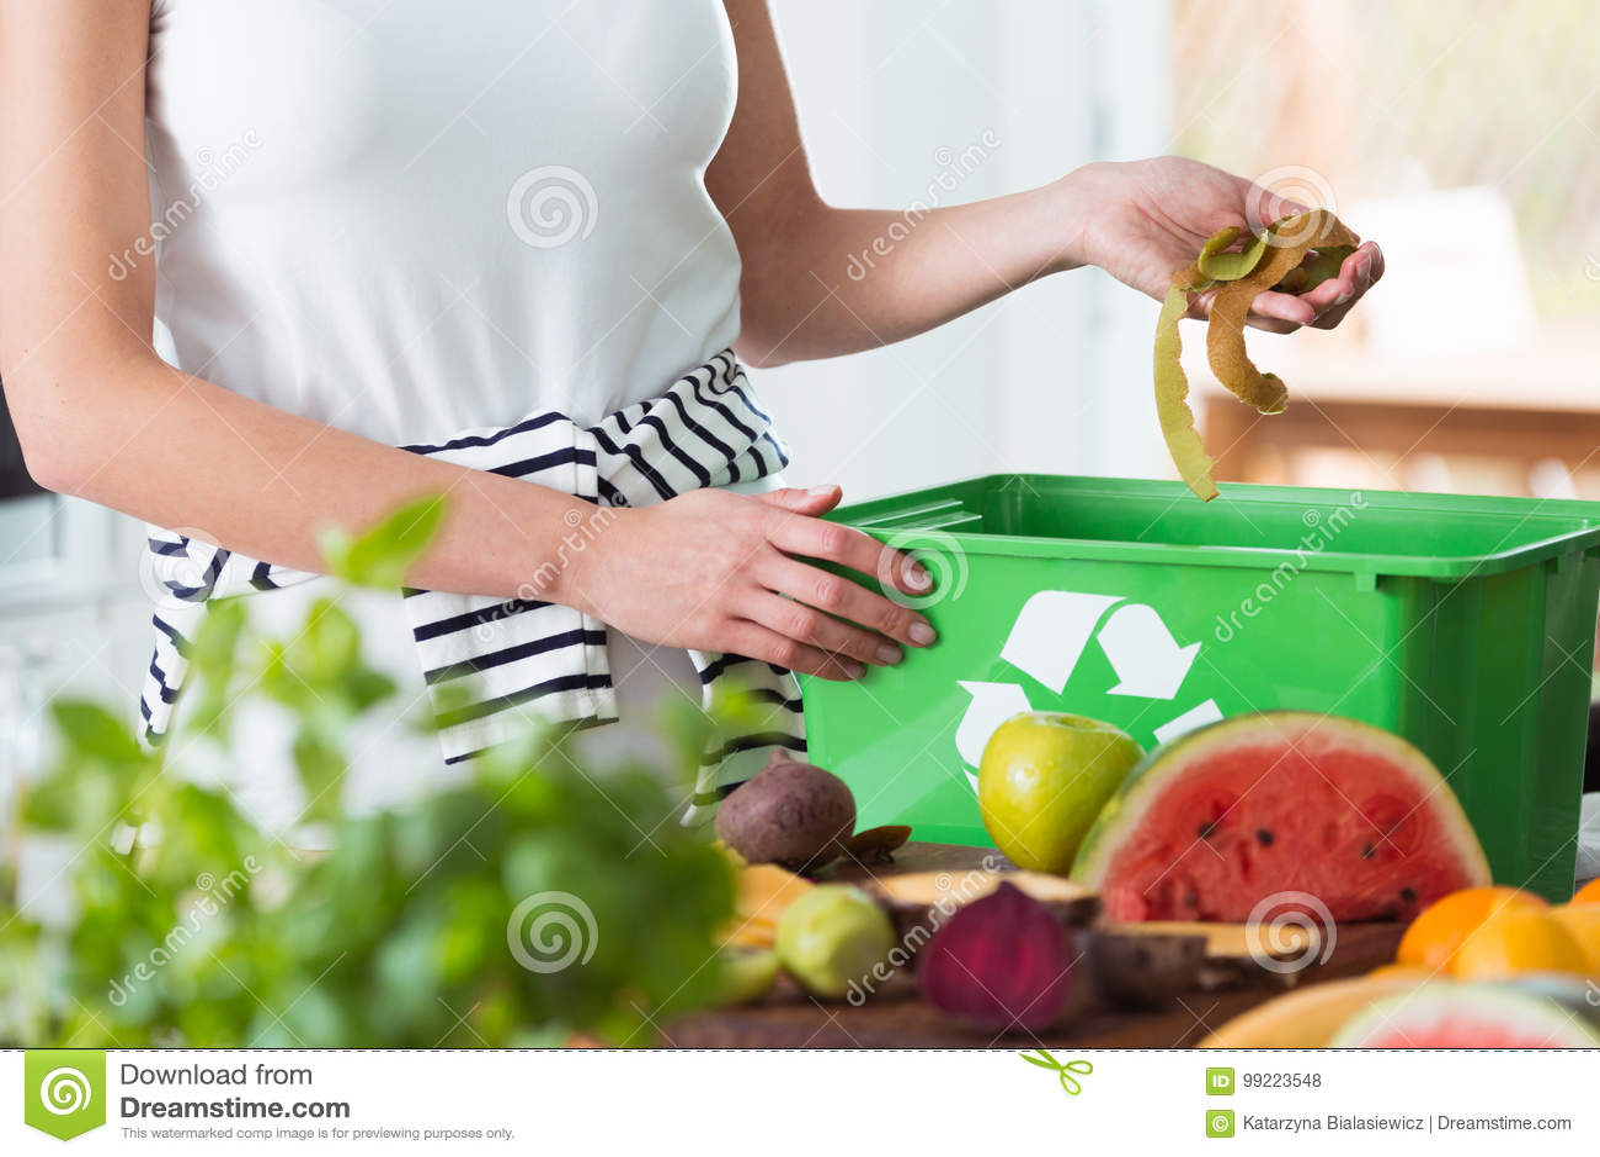 kitchen composter cabinets for mobile homes 堆肥有机厨房废物的妇女库存照片 图片包括有绿色 概念 申请人 室内 回收有机厨房废物的妇女通过堆肥在绿色容器在膳食的准备时